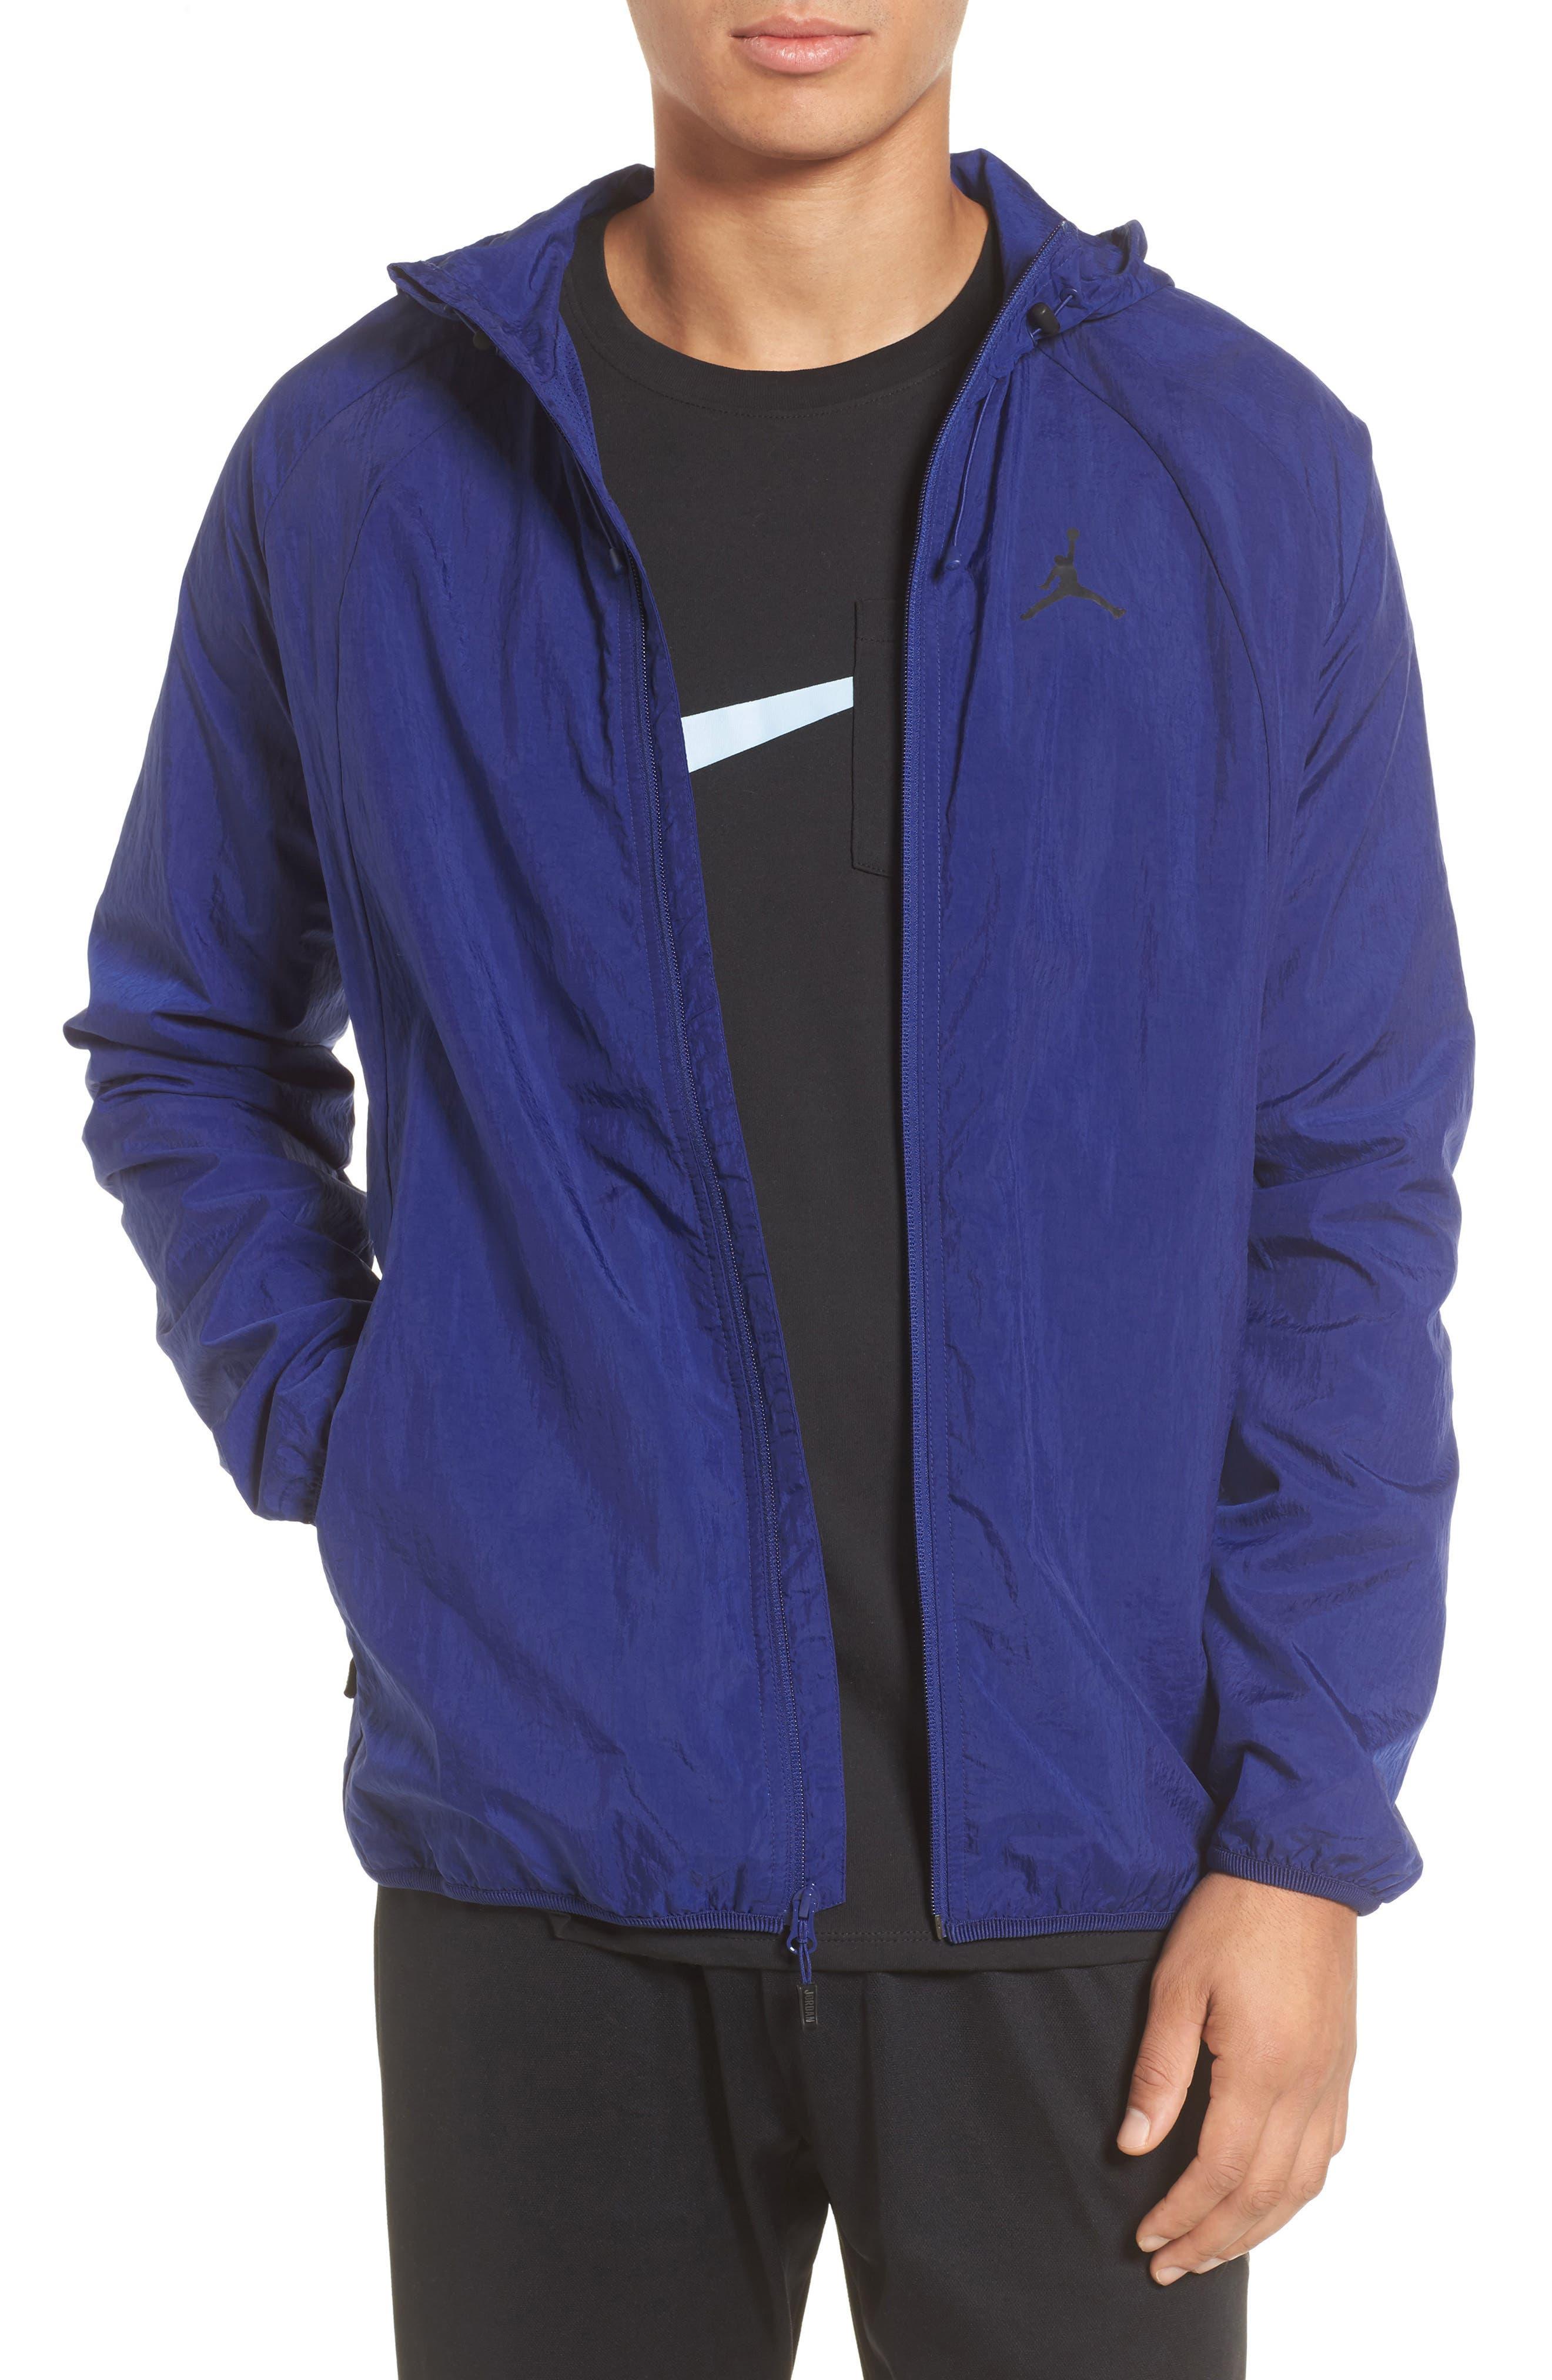 Wings Windbreaker Jacket,                         Main,                         color, Deep Royal Blue